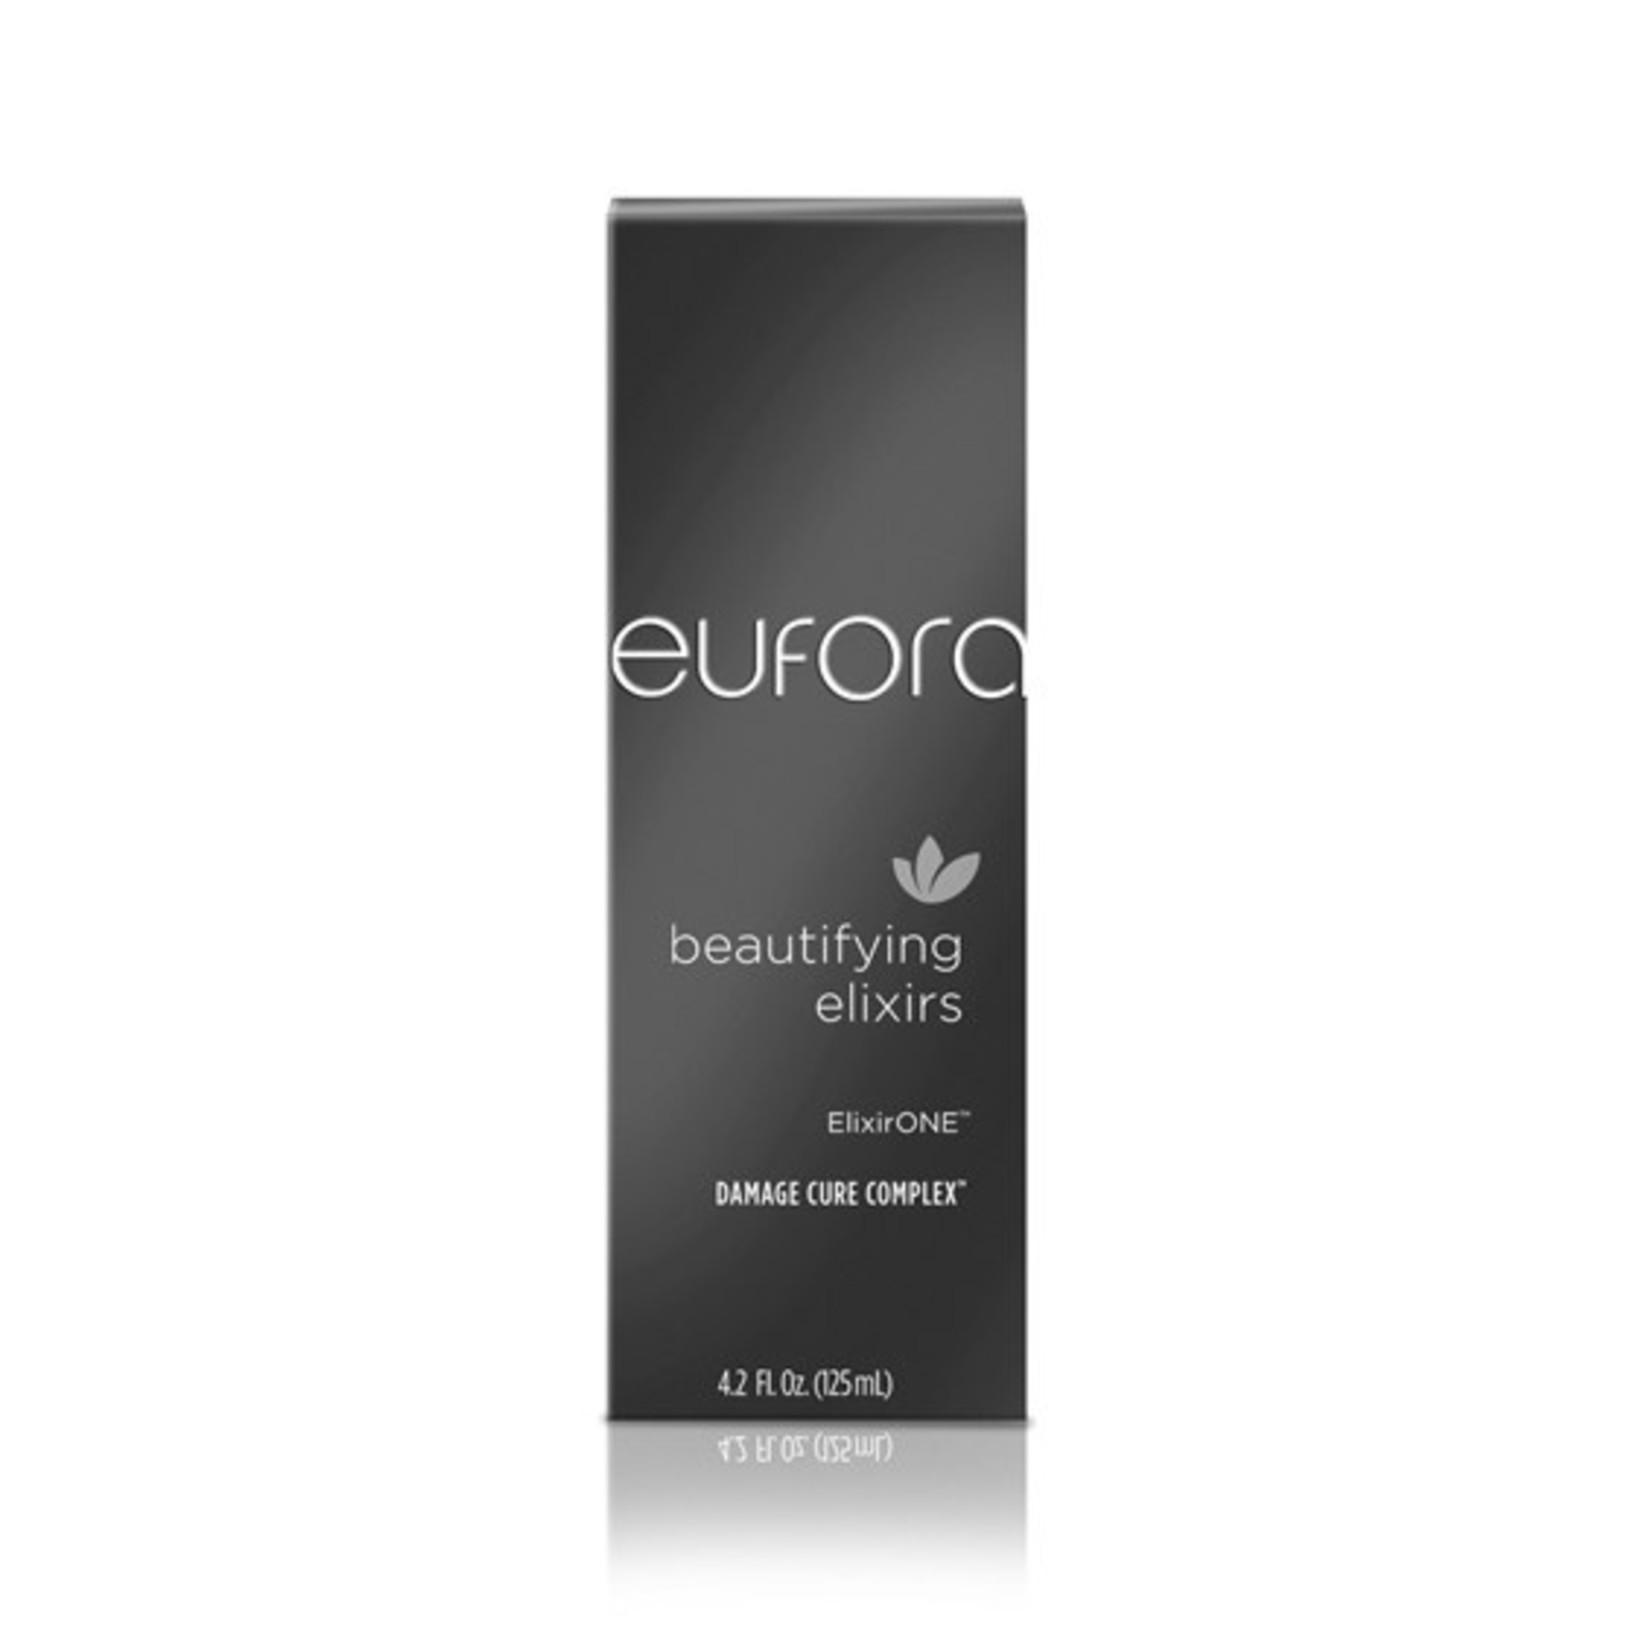 Eufora ElixirONE